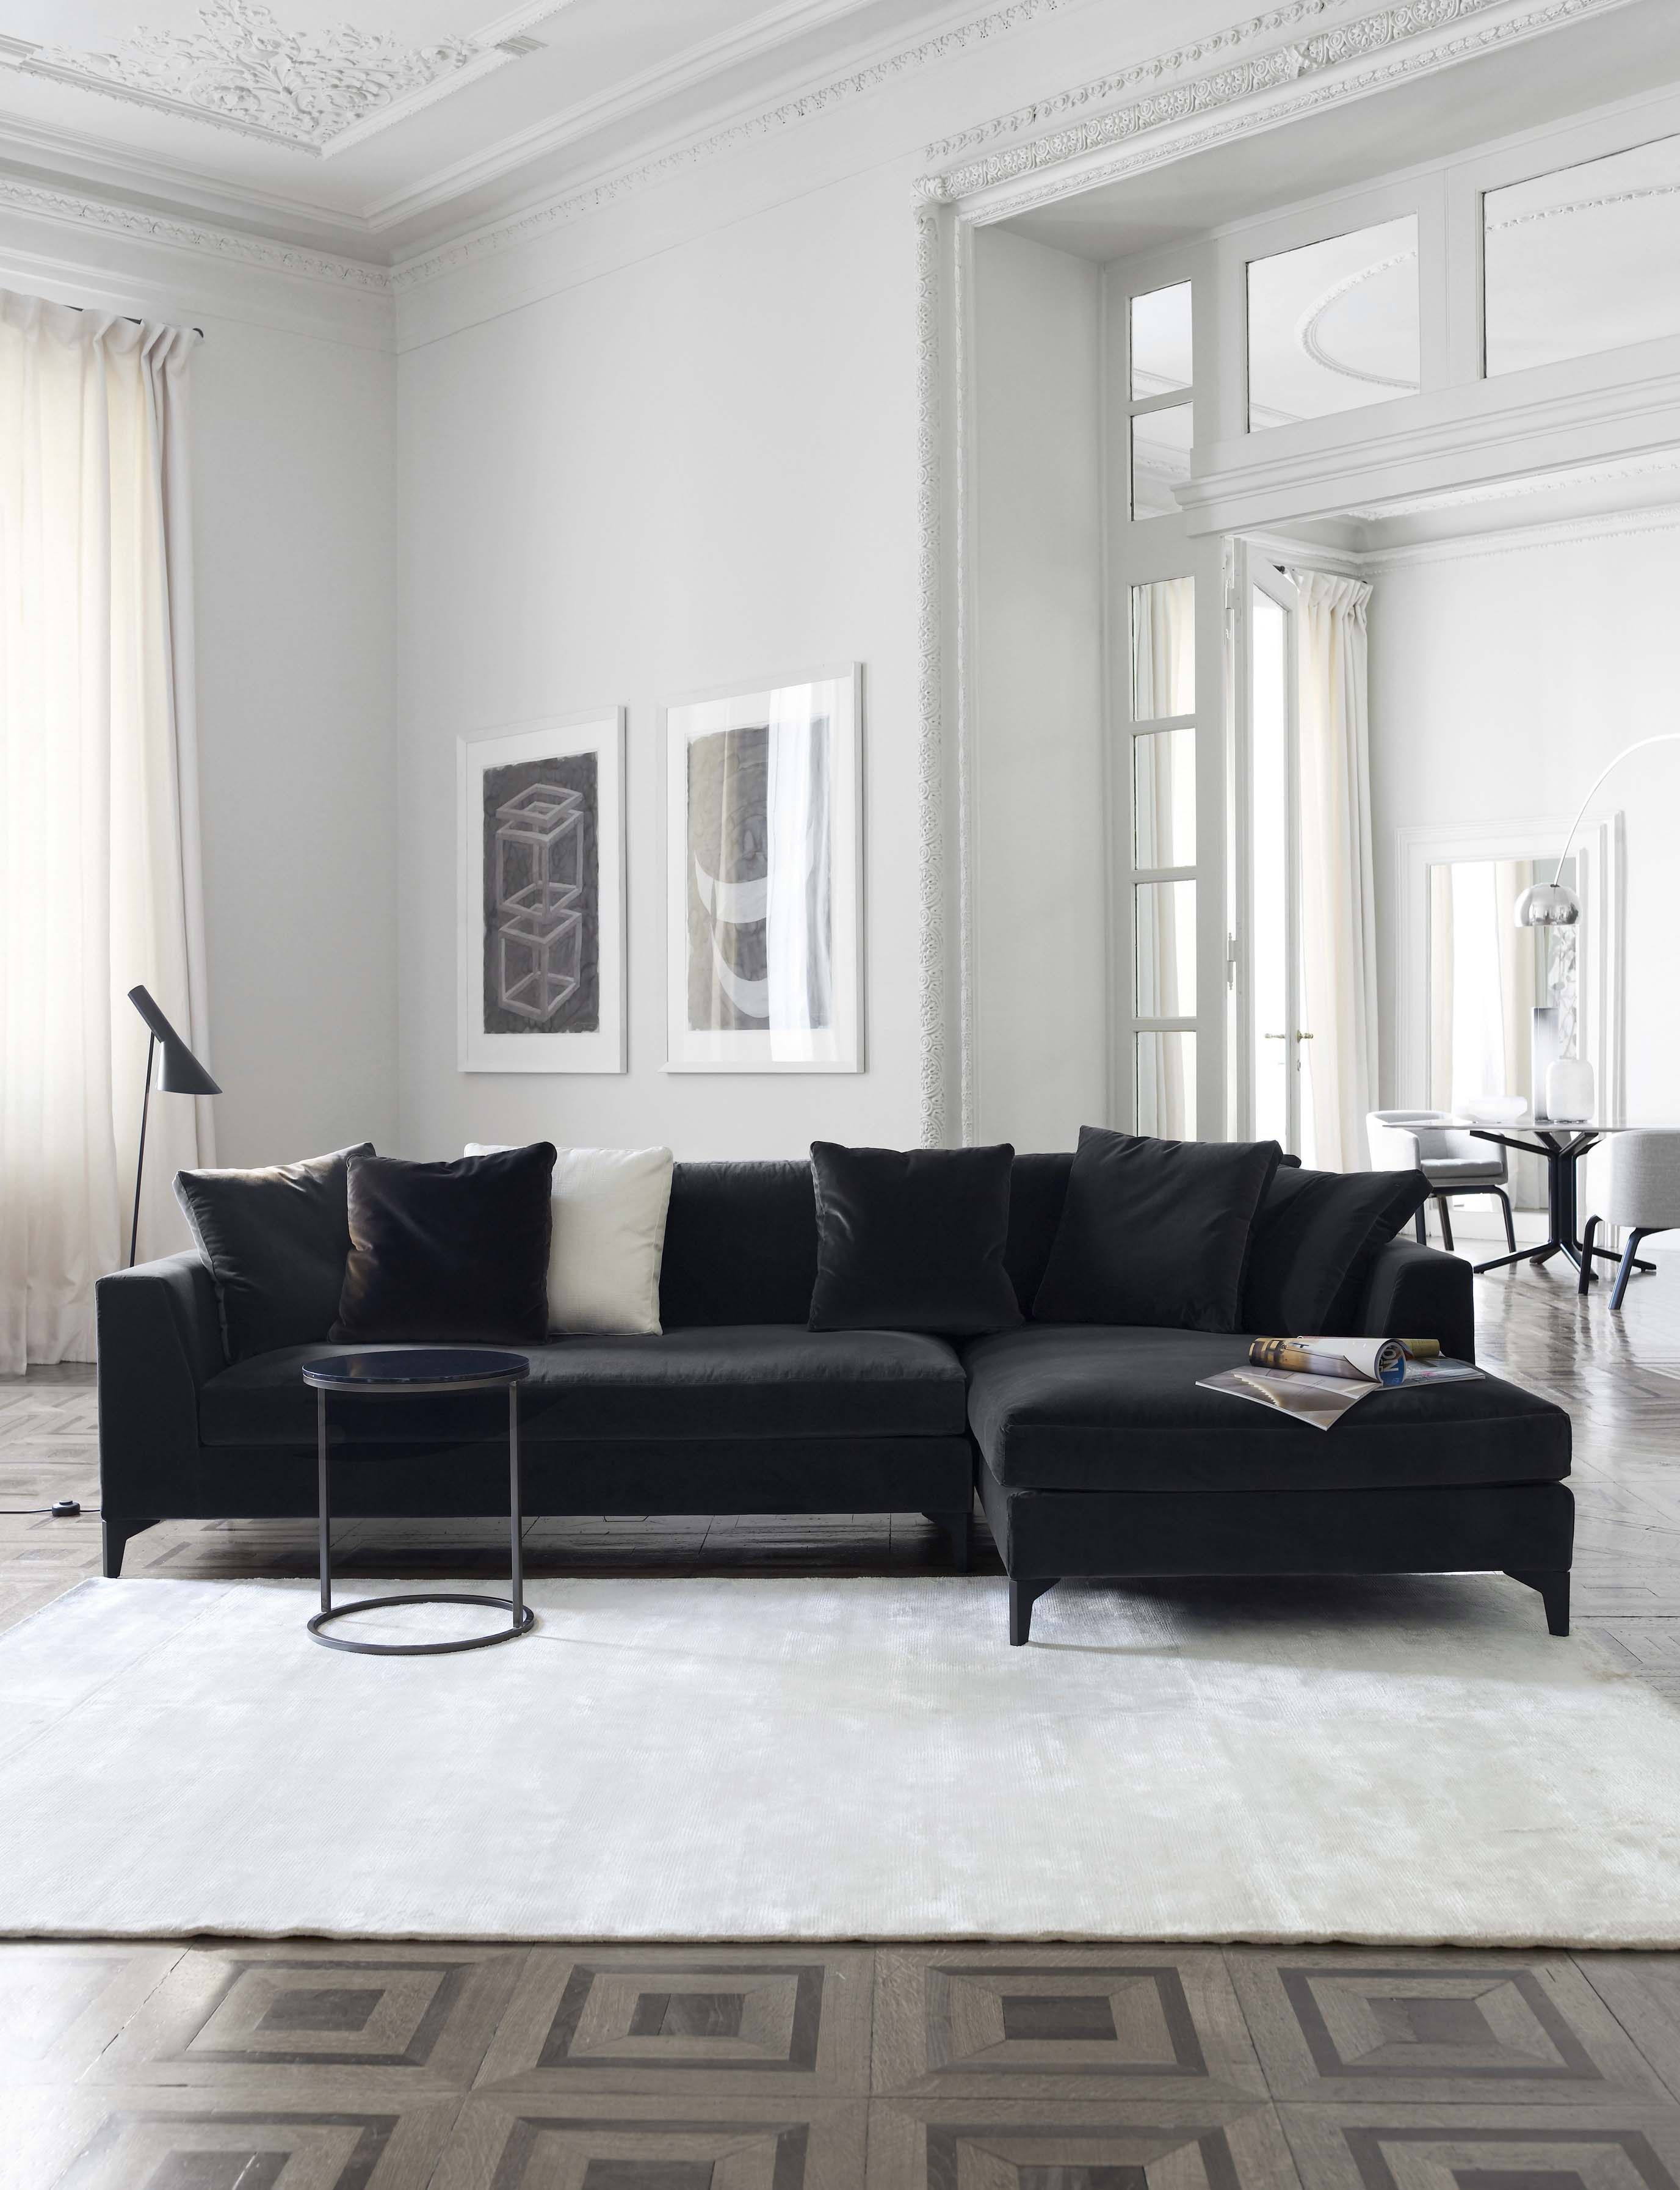 MERIDIANI I LEWIS UP modular sofa I PECK low table I LALIT rug ...